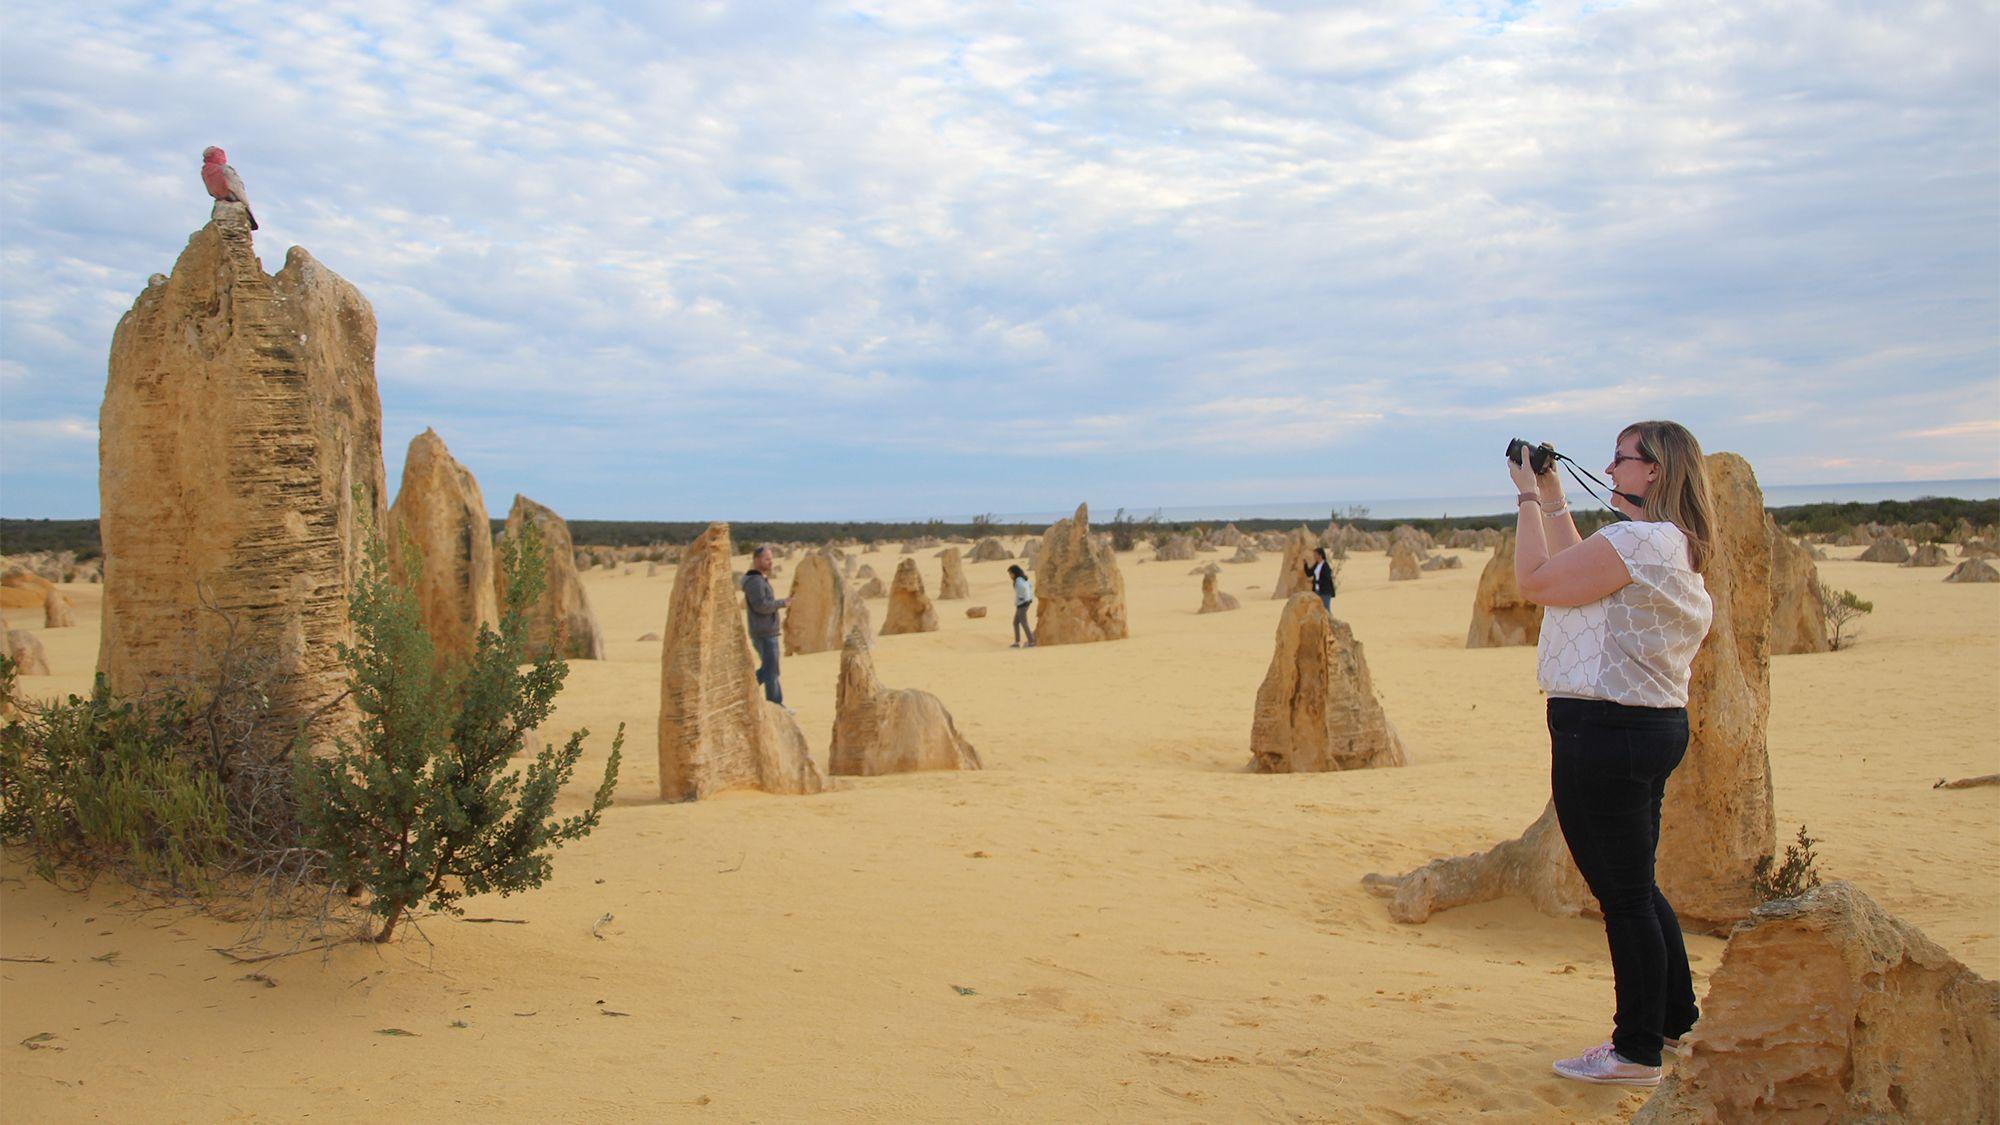 Woman taking photos on the Pinnacles & Sandboarding Tour in Perth